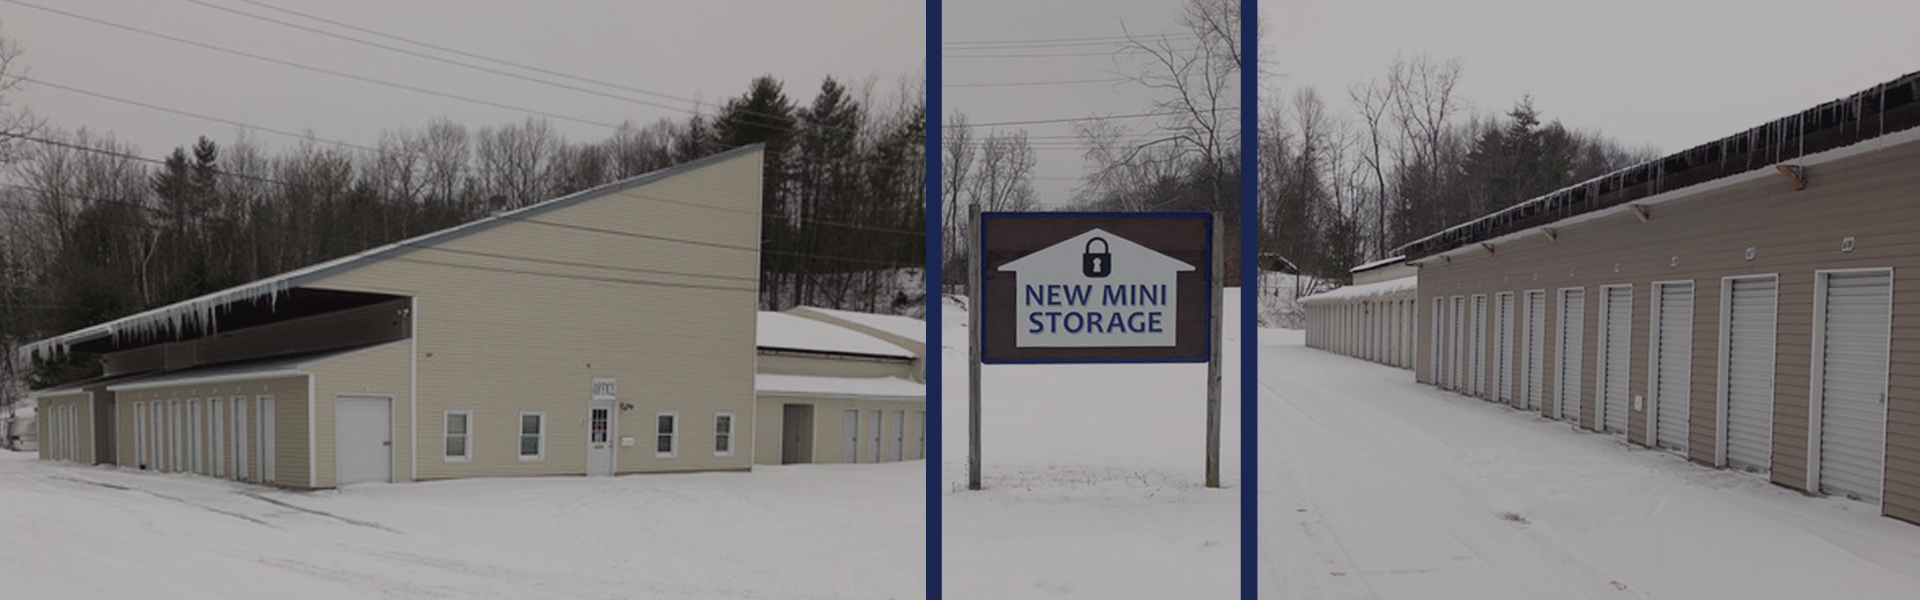 Local Self-Storage Facility & Storage Units in Essex Junction VT   Self Storage Facility